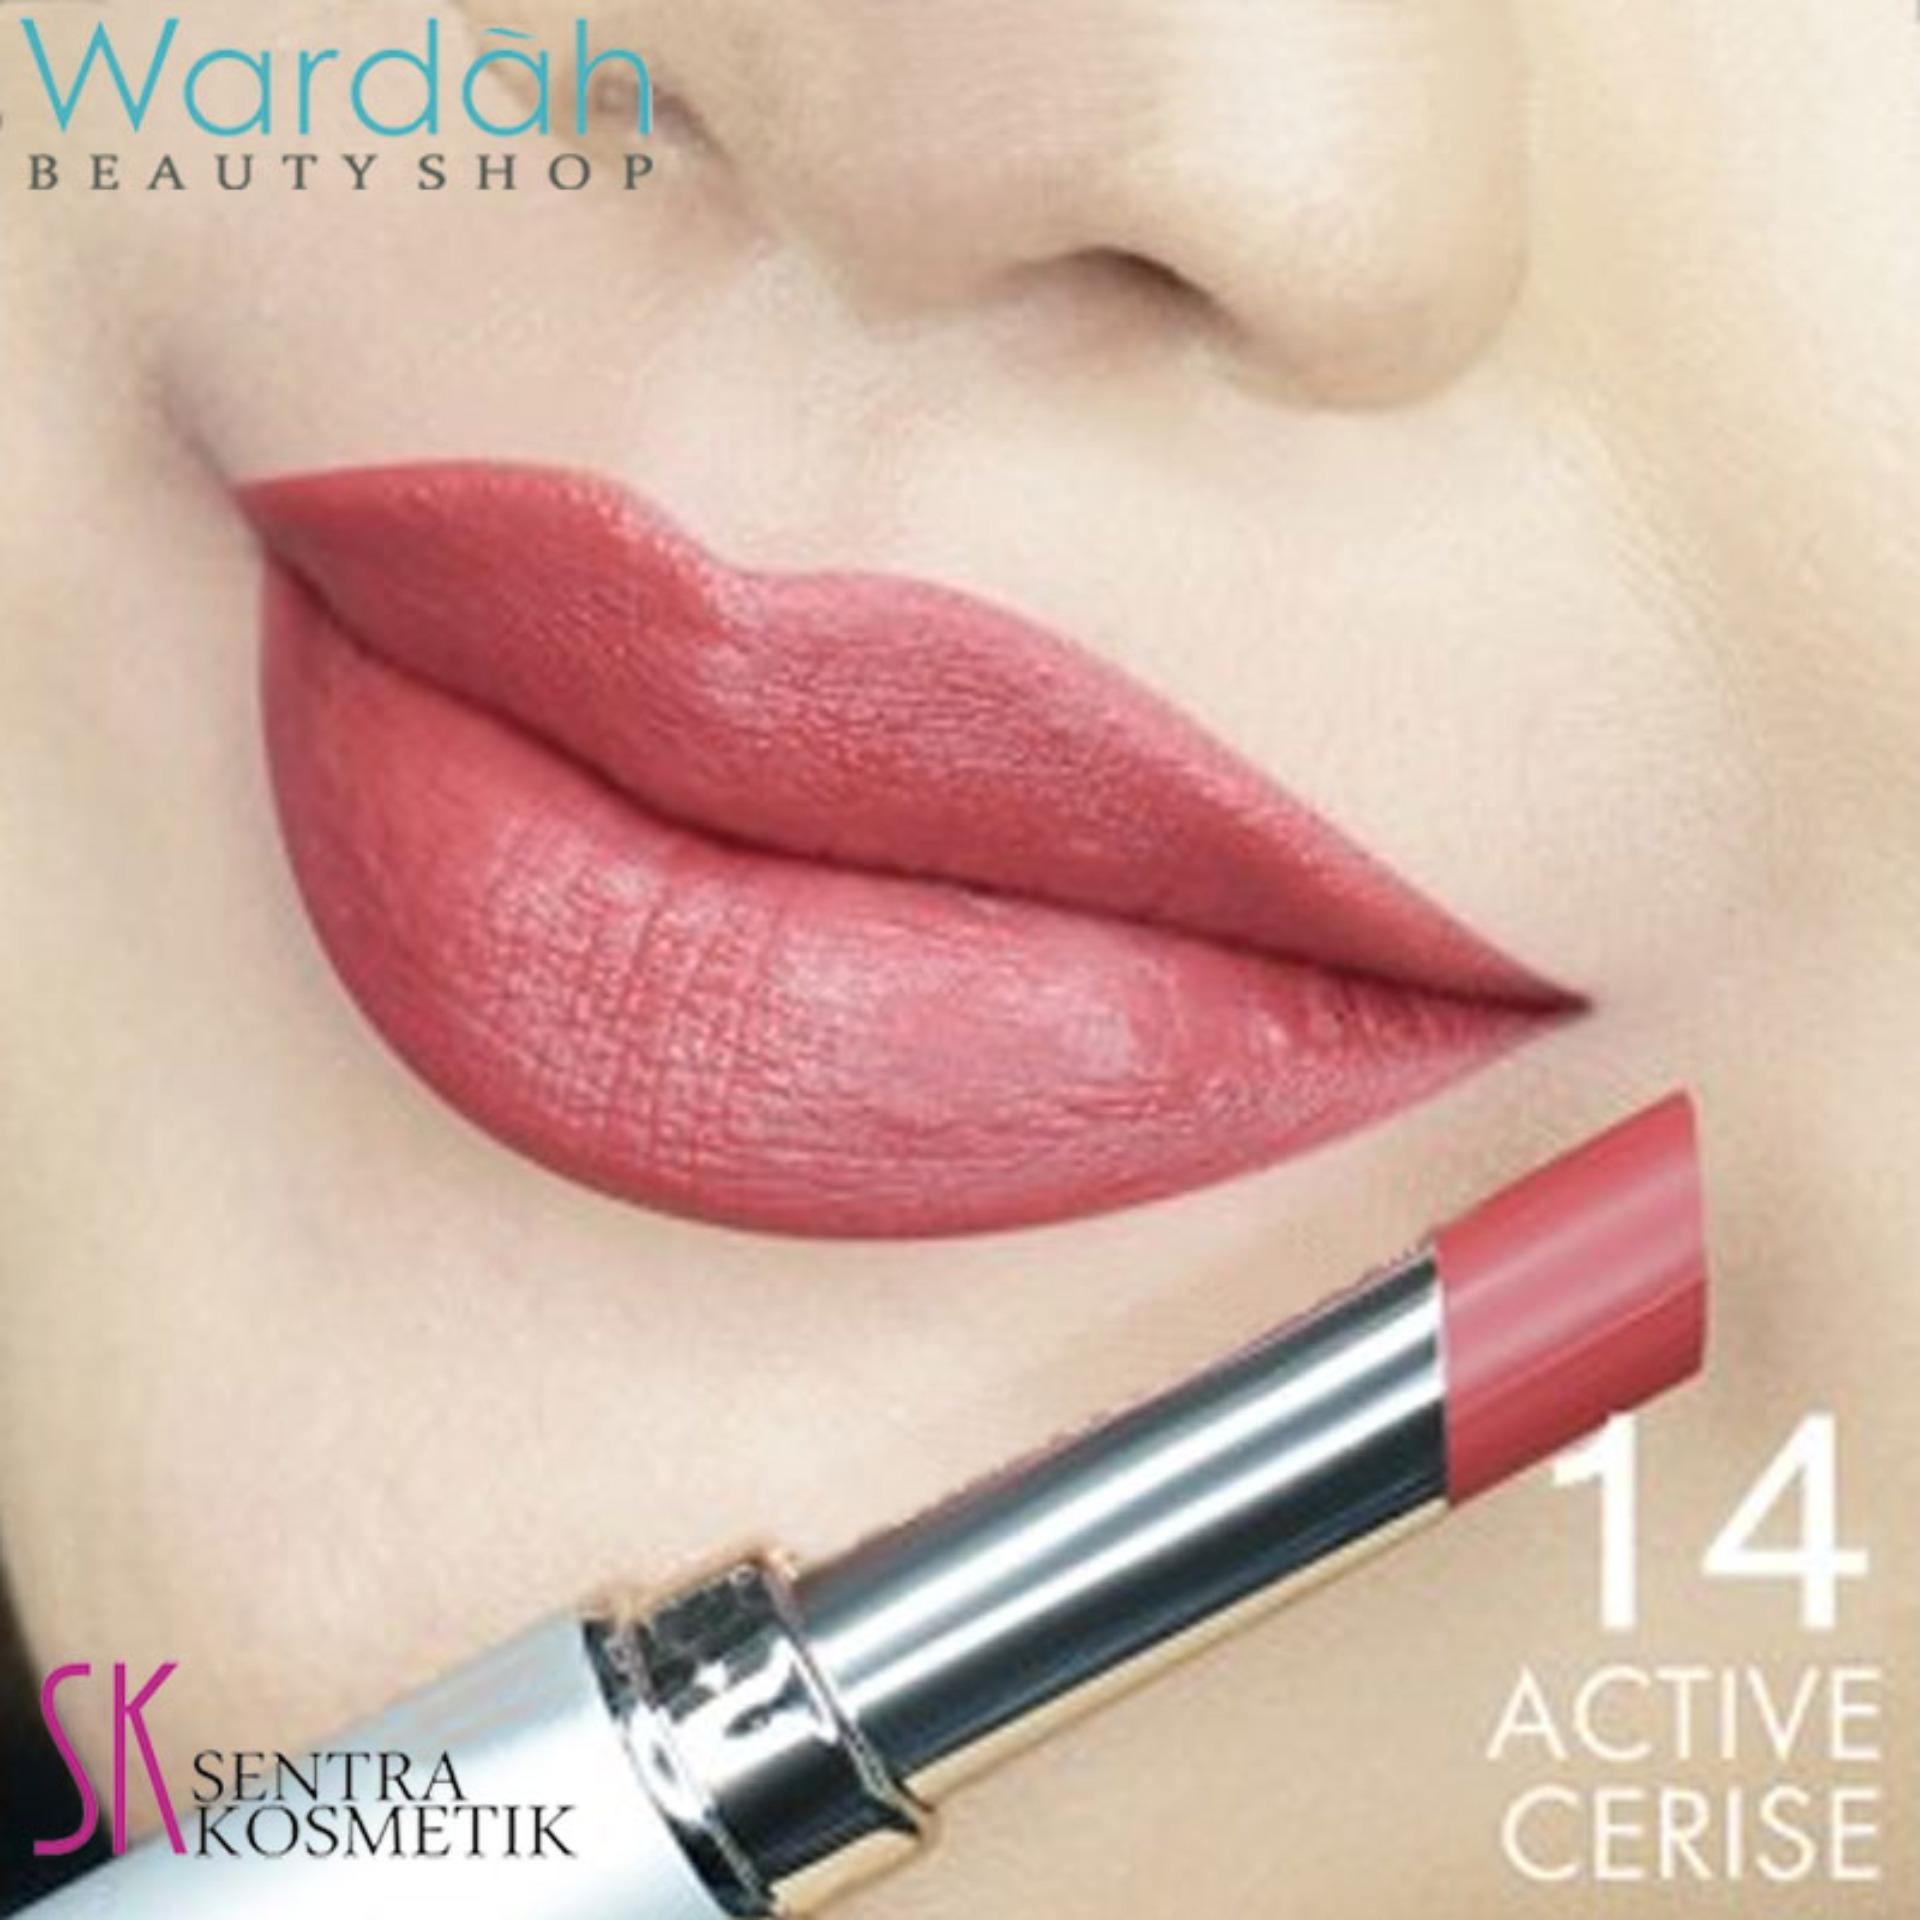 Wardah INTENSE MATTE LIPSTICK 14 - Active Cerise